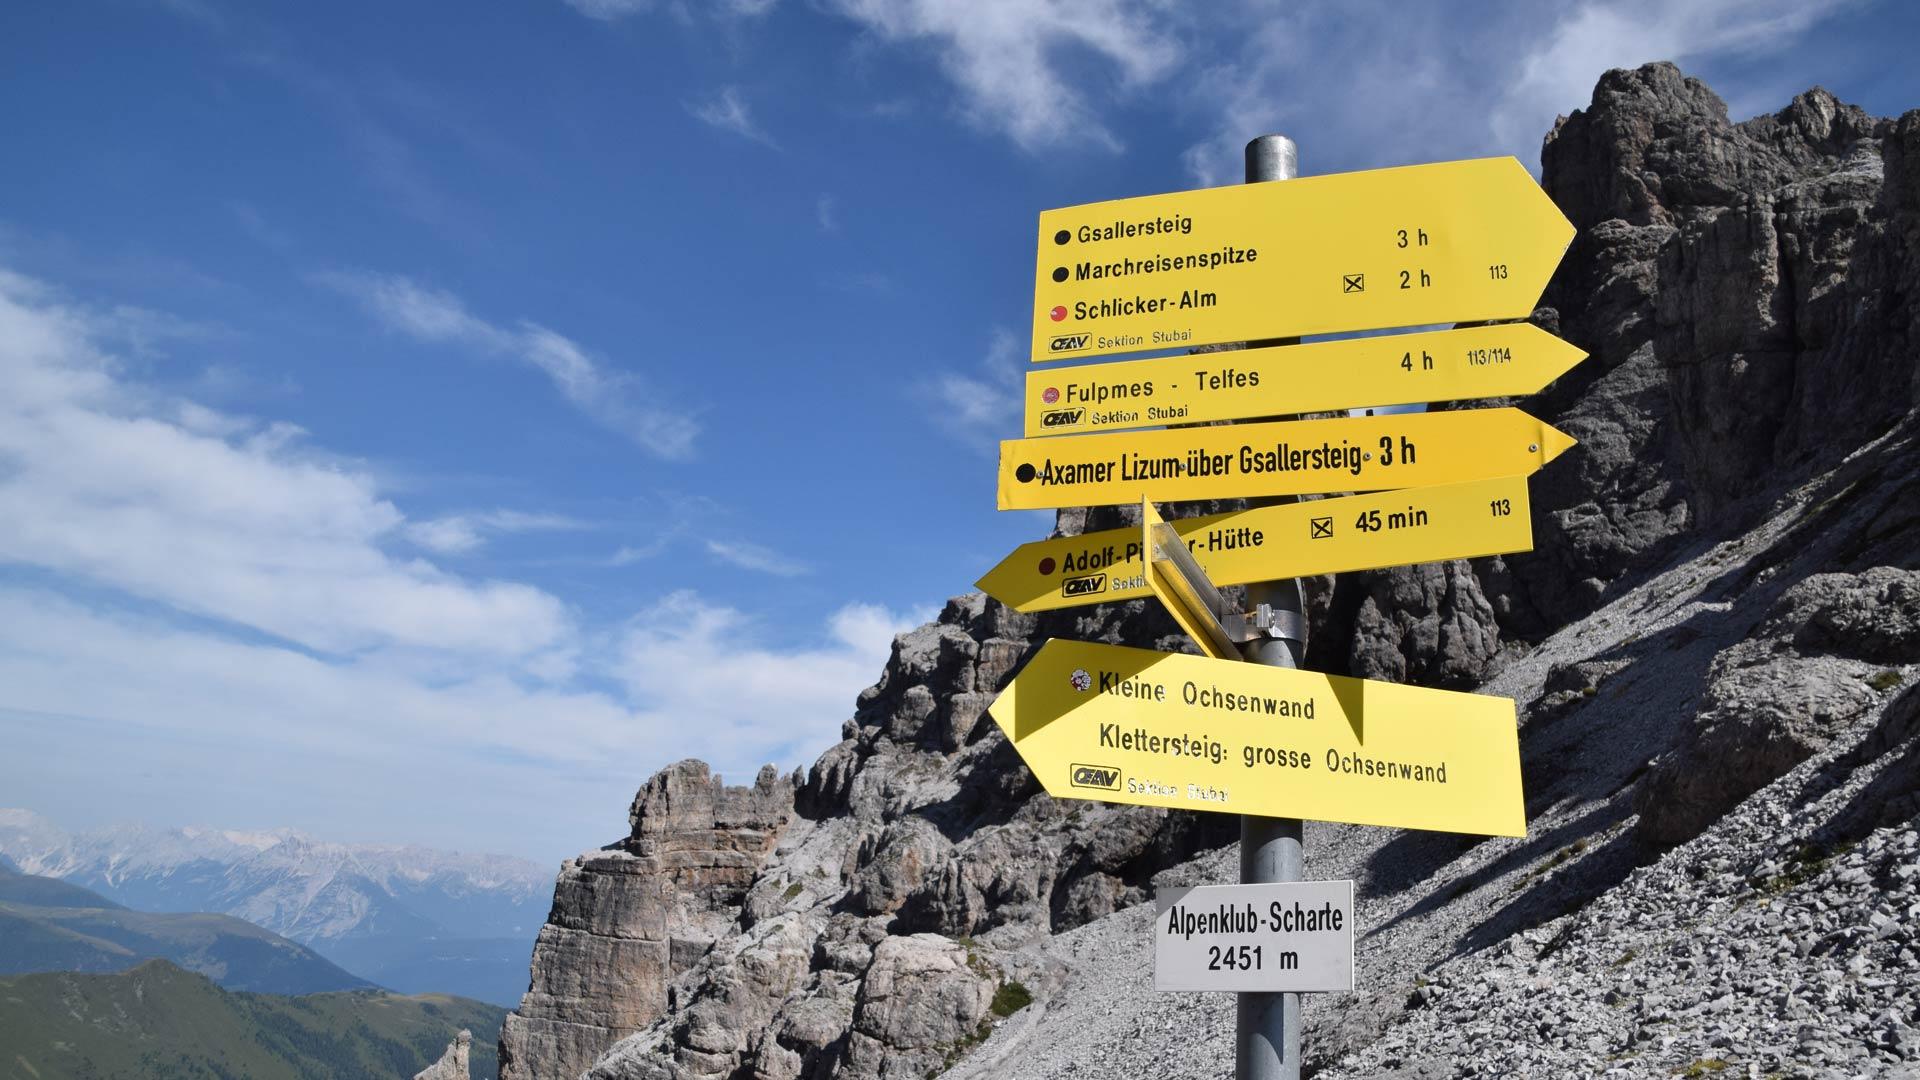 Stubai Klettersteigset : Salewa premium attac klettersteigset stubai fuse helm weiß eur